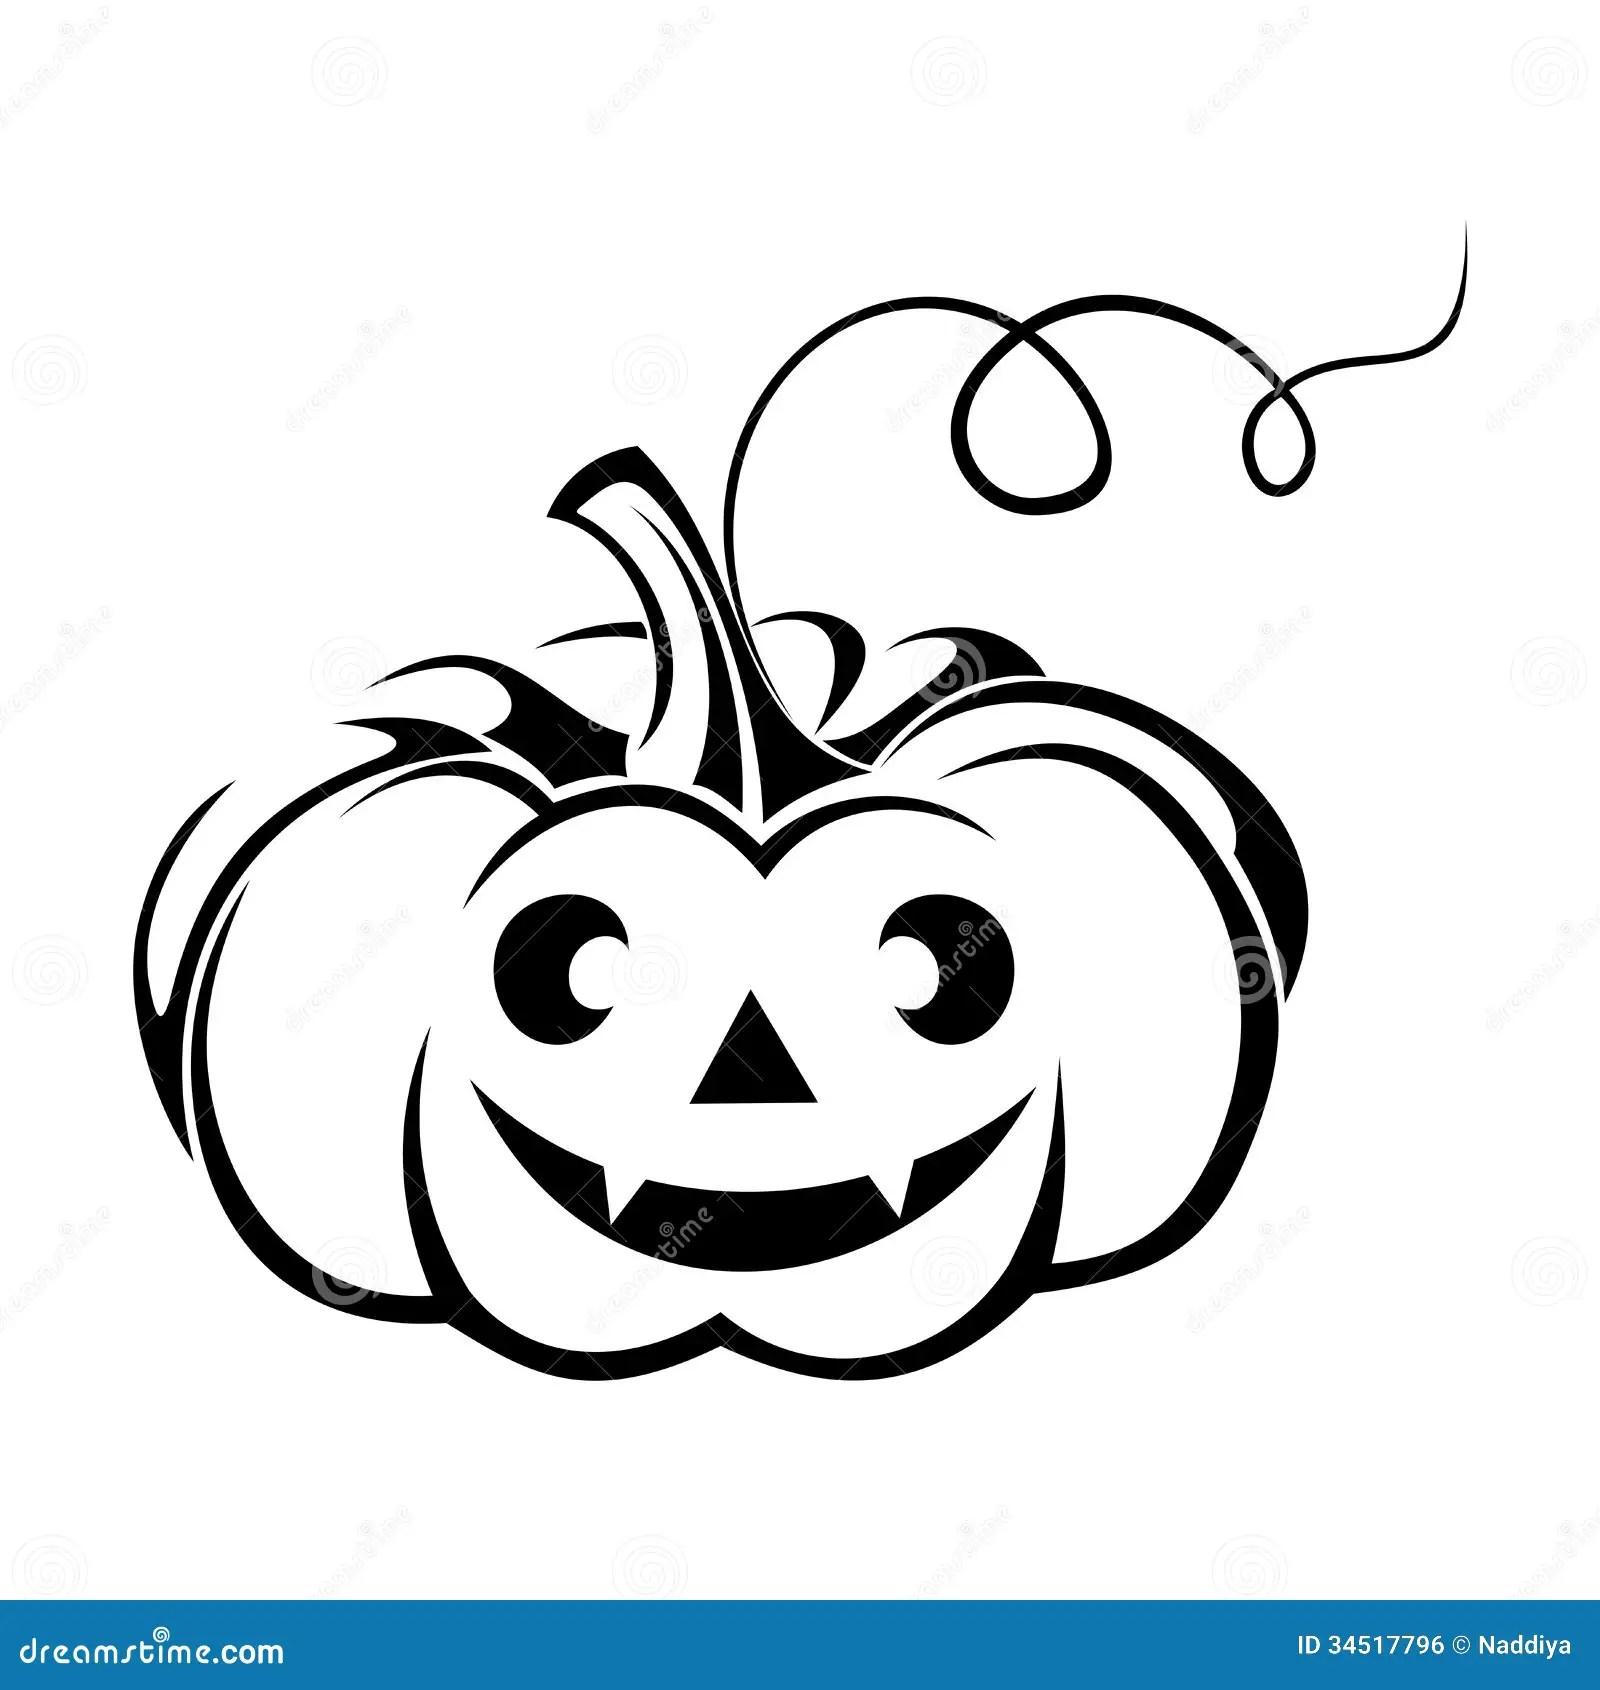 Black Silhouette Of Jack O Lantern Halloween Pump Royalty